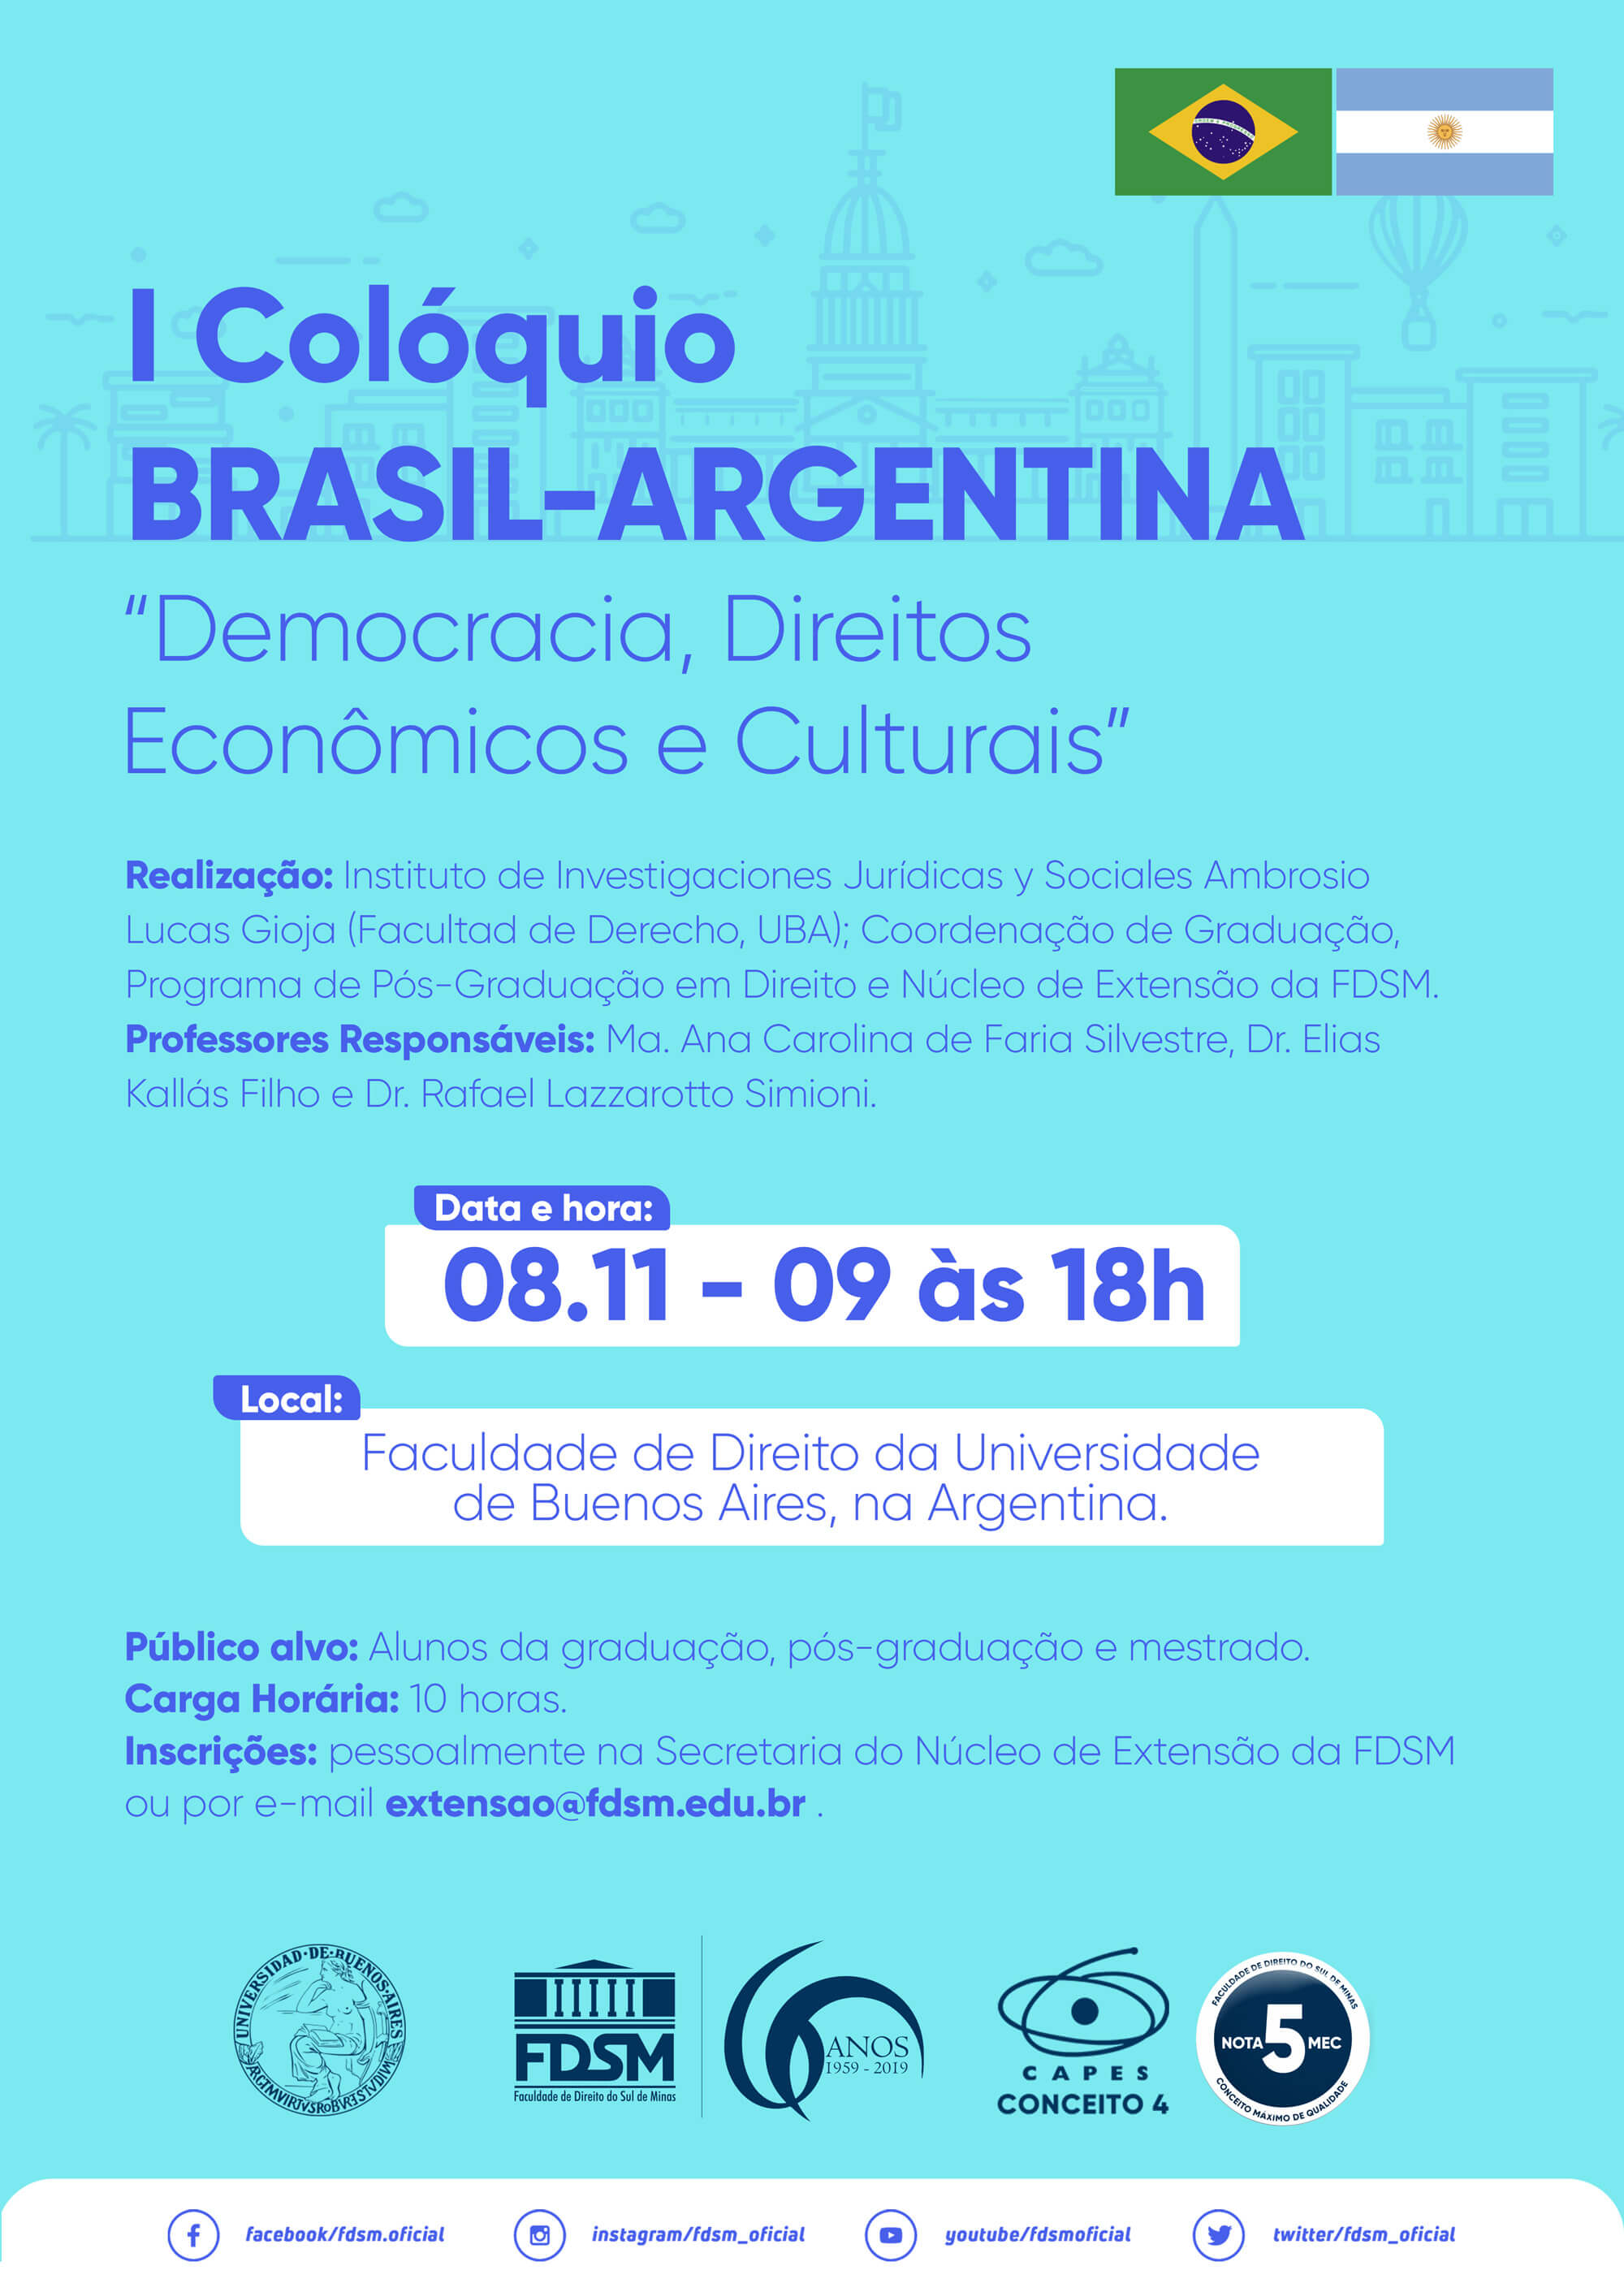 Cód 525: I Colóquio BRASIL-ARGENTINA